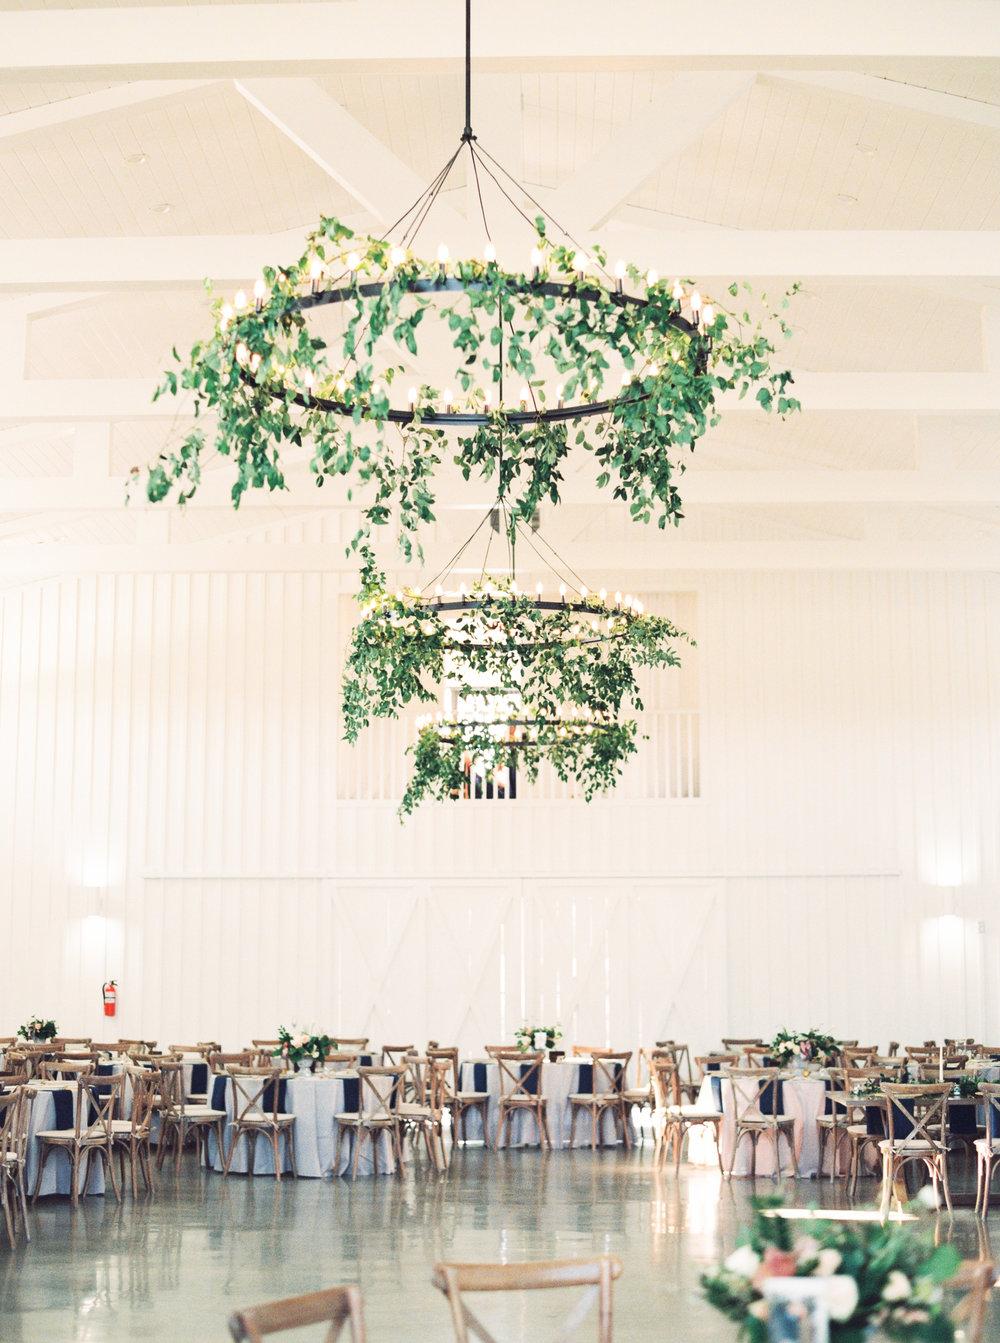 Austin Wedding Chandelier with Greenery